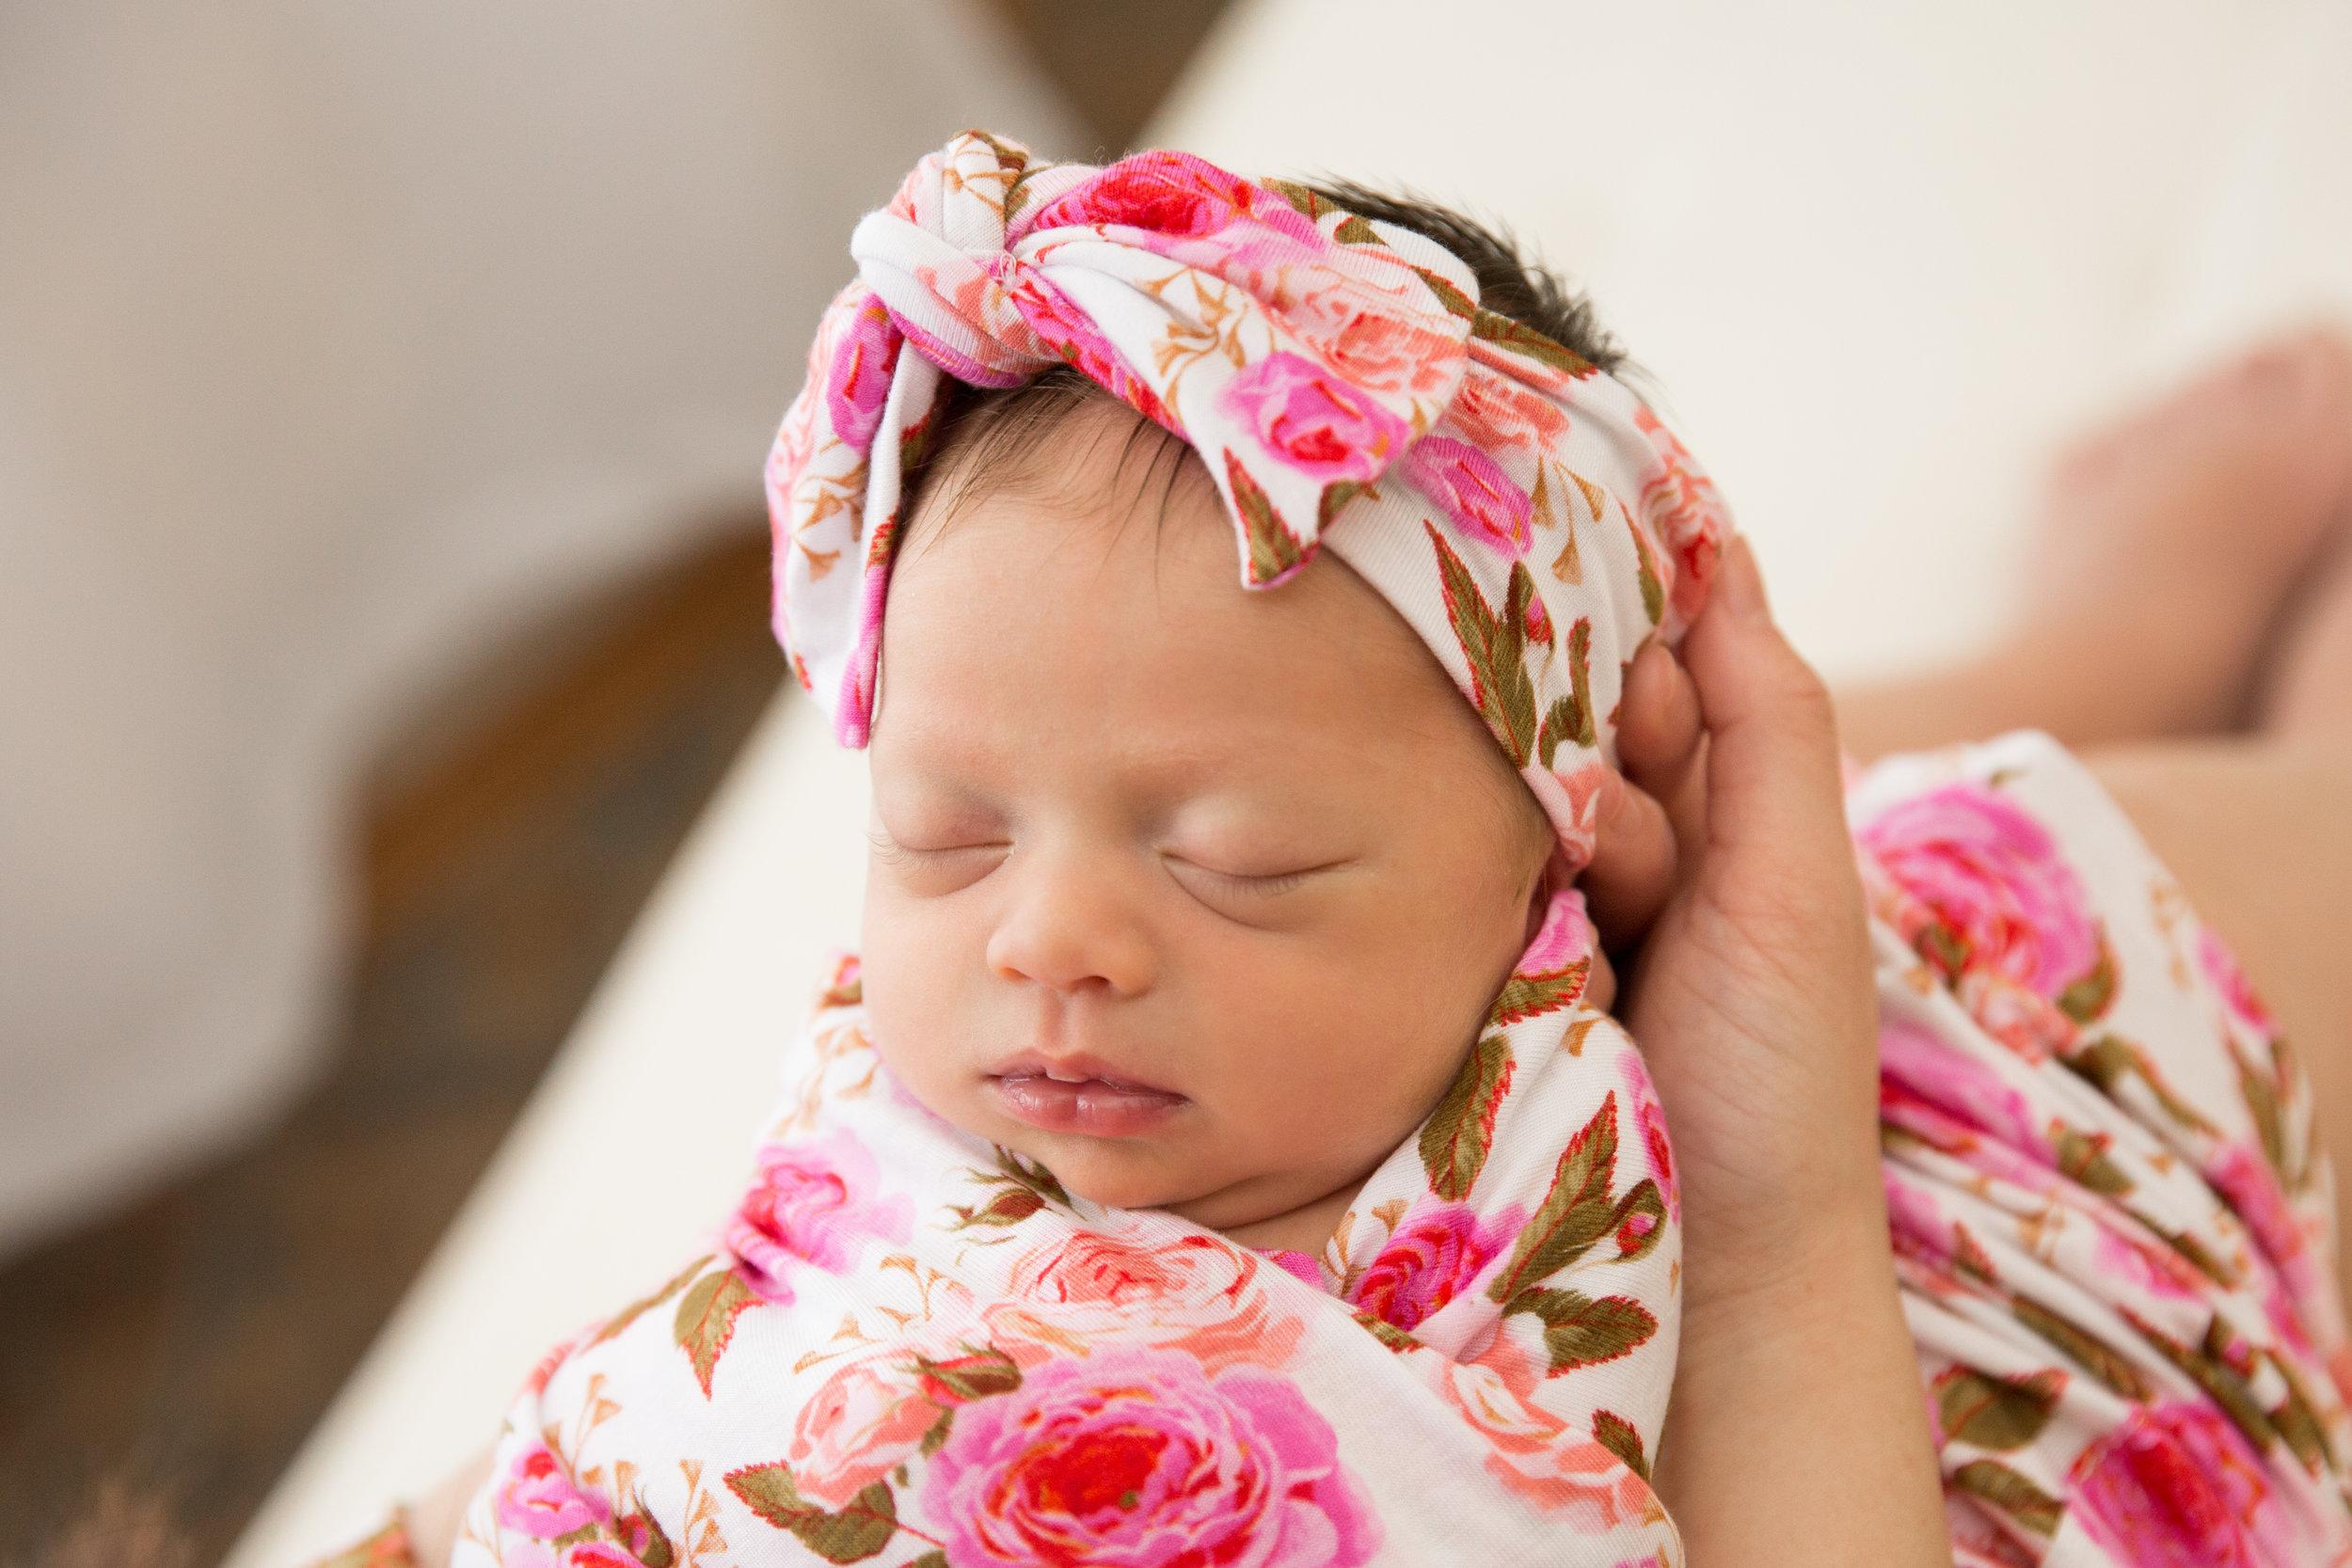 Lake Stevens Lifestyle newborn photographer in snohomish county